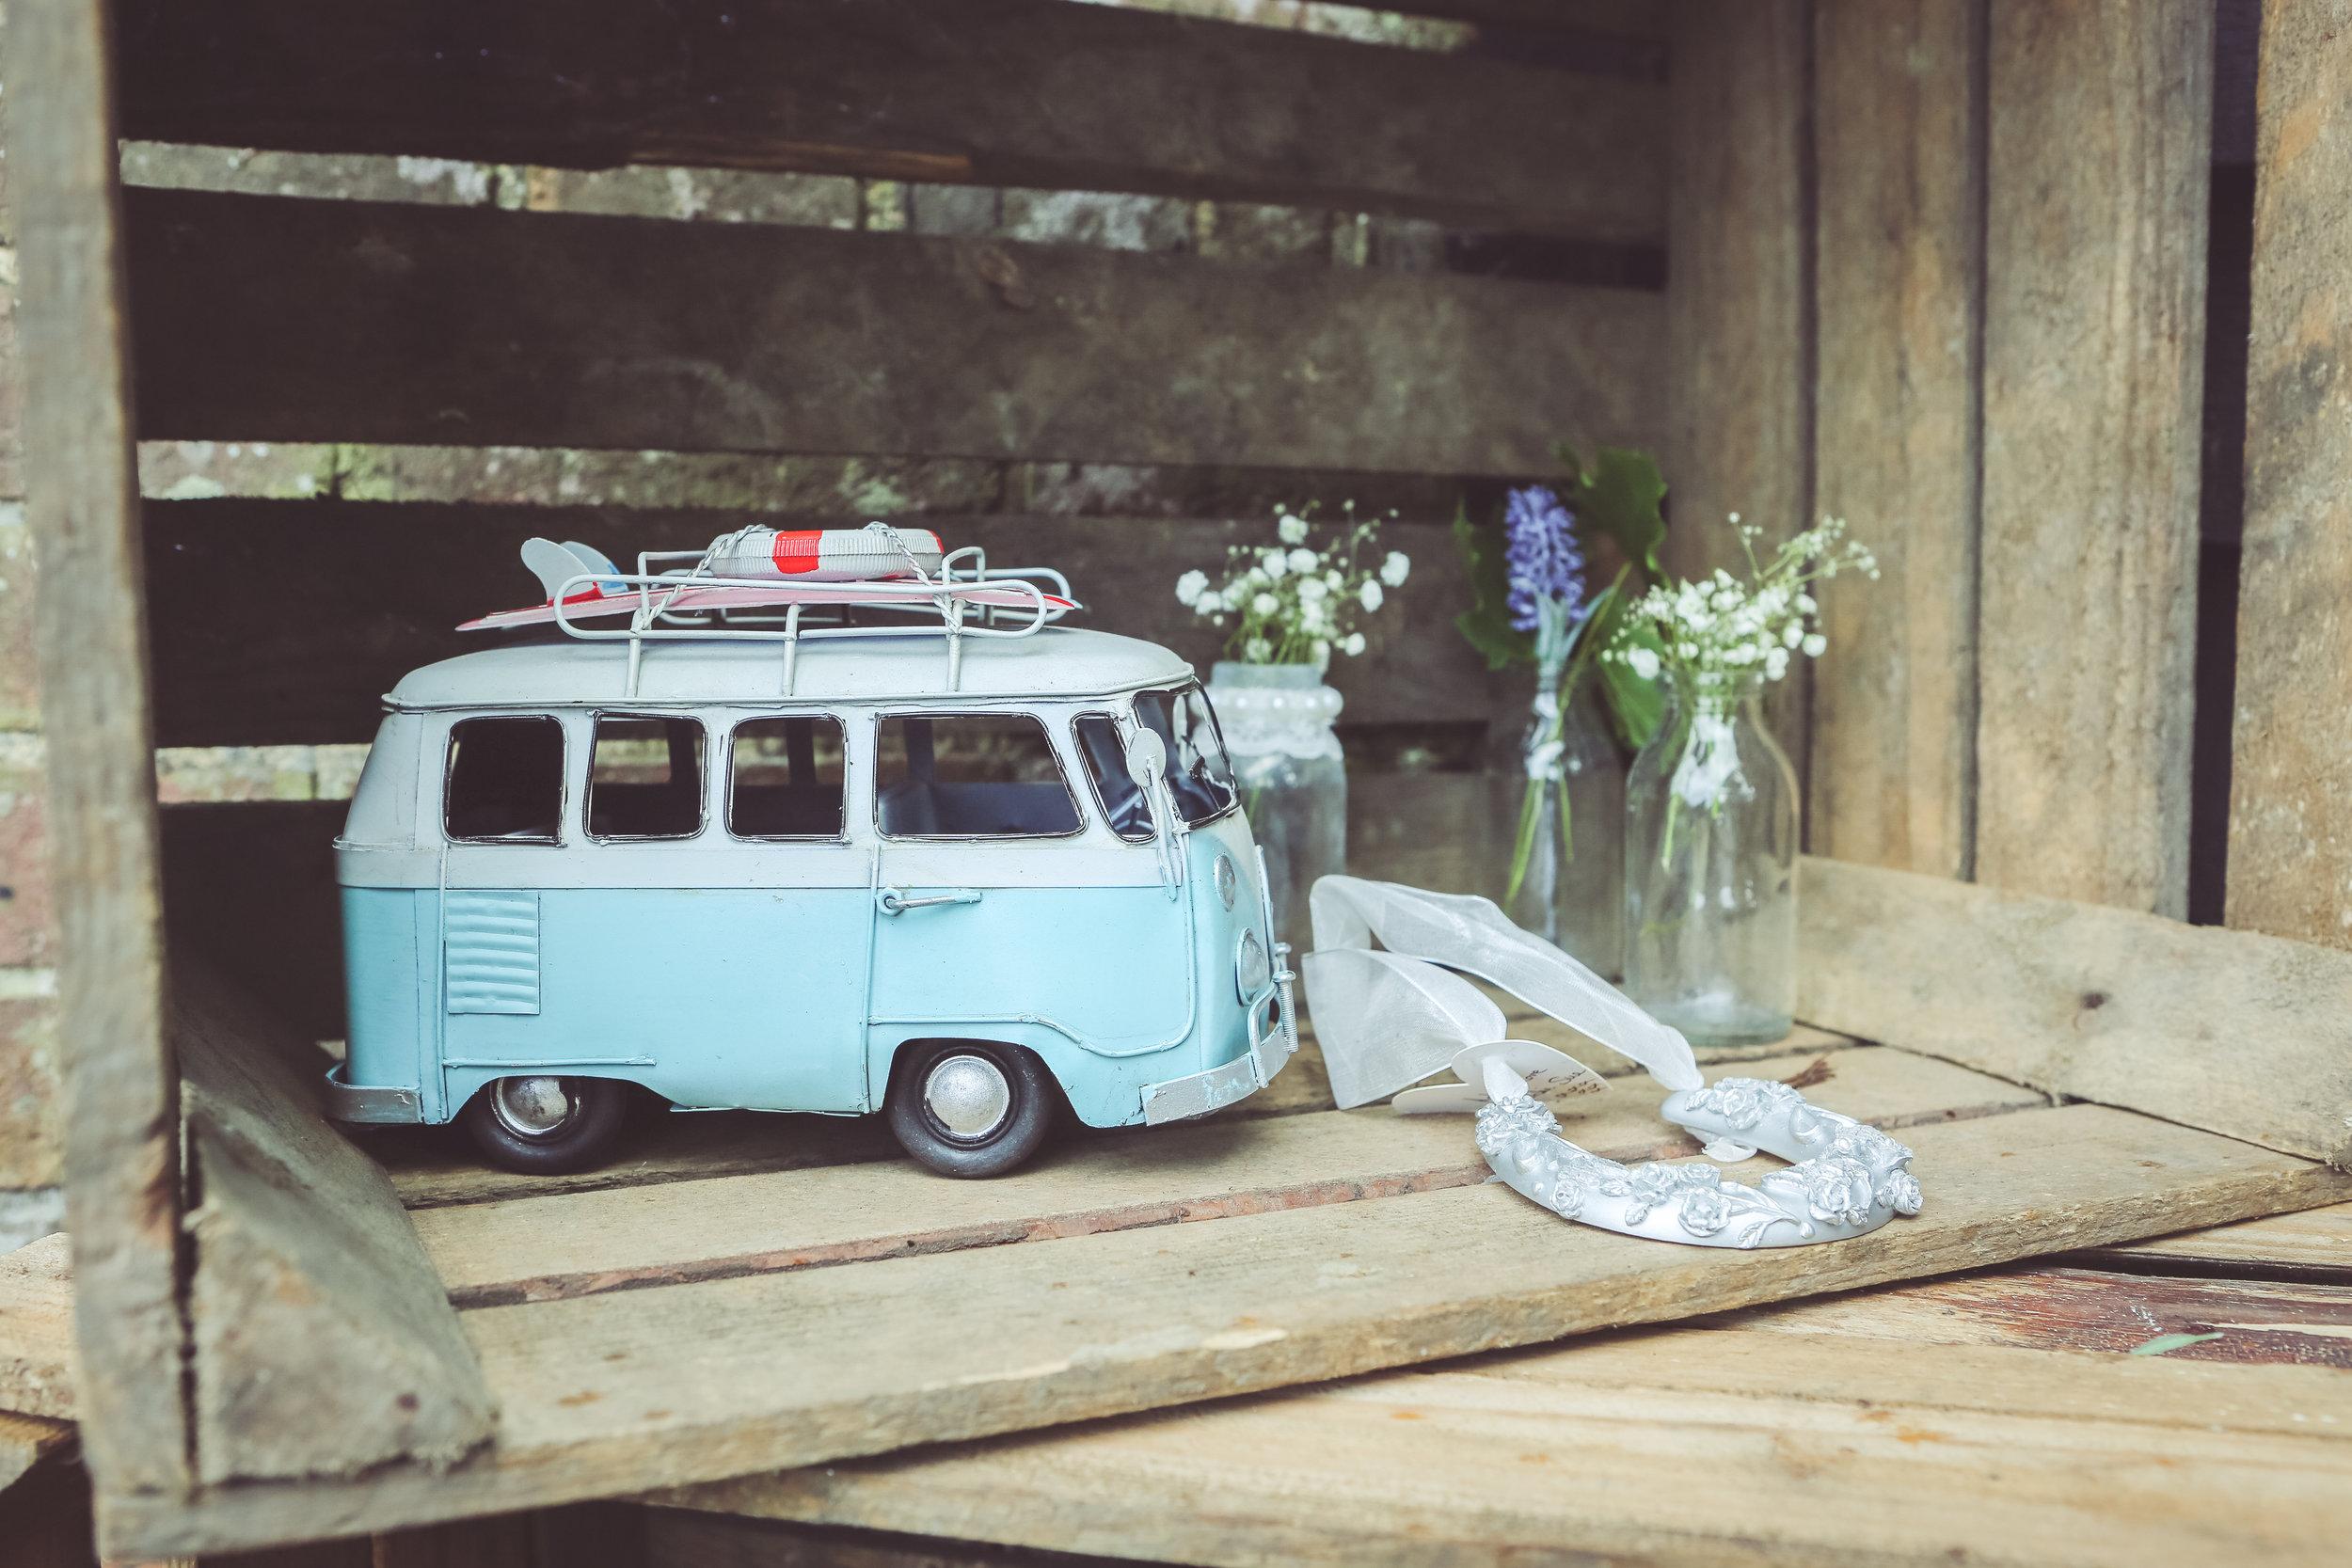 Amy & Adam Wedding - July 2nd 2016 Sussex BarnAmy & Adam Wedding - Sussex BarnFRNH2297.jpg